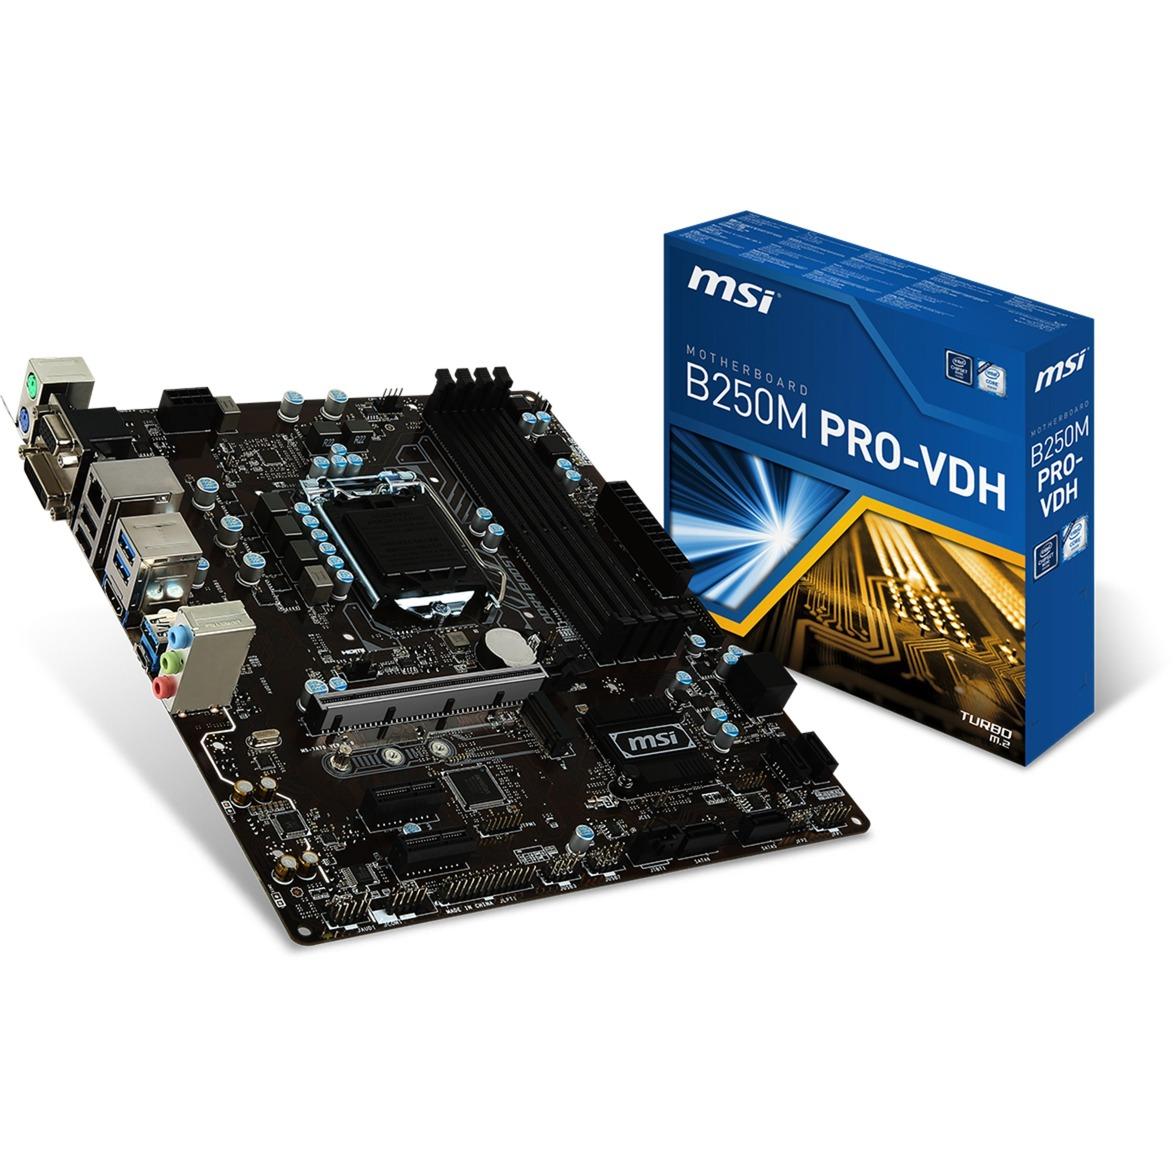 B250M PRO-VDH LGA 1151 (Zócalo H4) Intel B250 micro ATX, Placa base